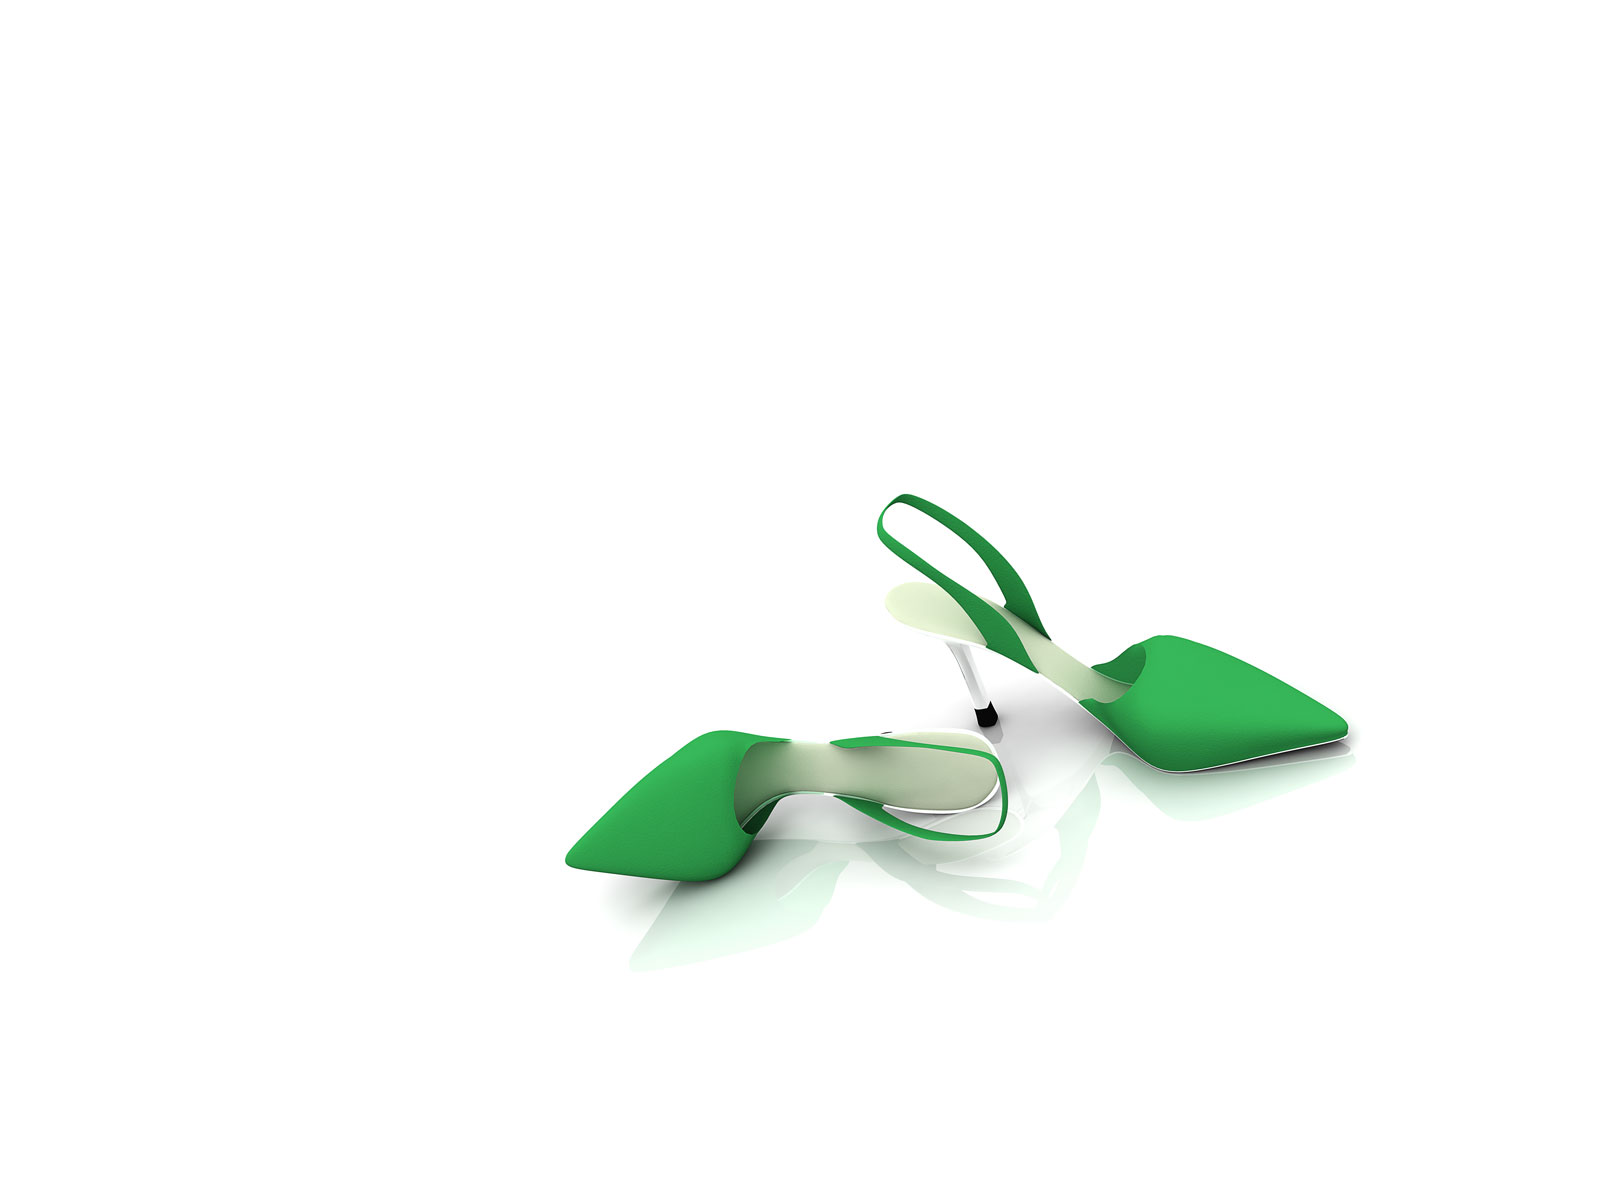 1600x1200 Pair of green shoes desktop PC and Mac wallpaper 1600x1200